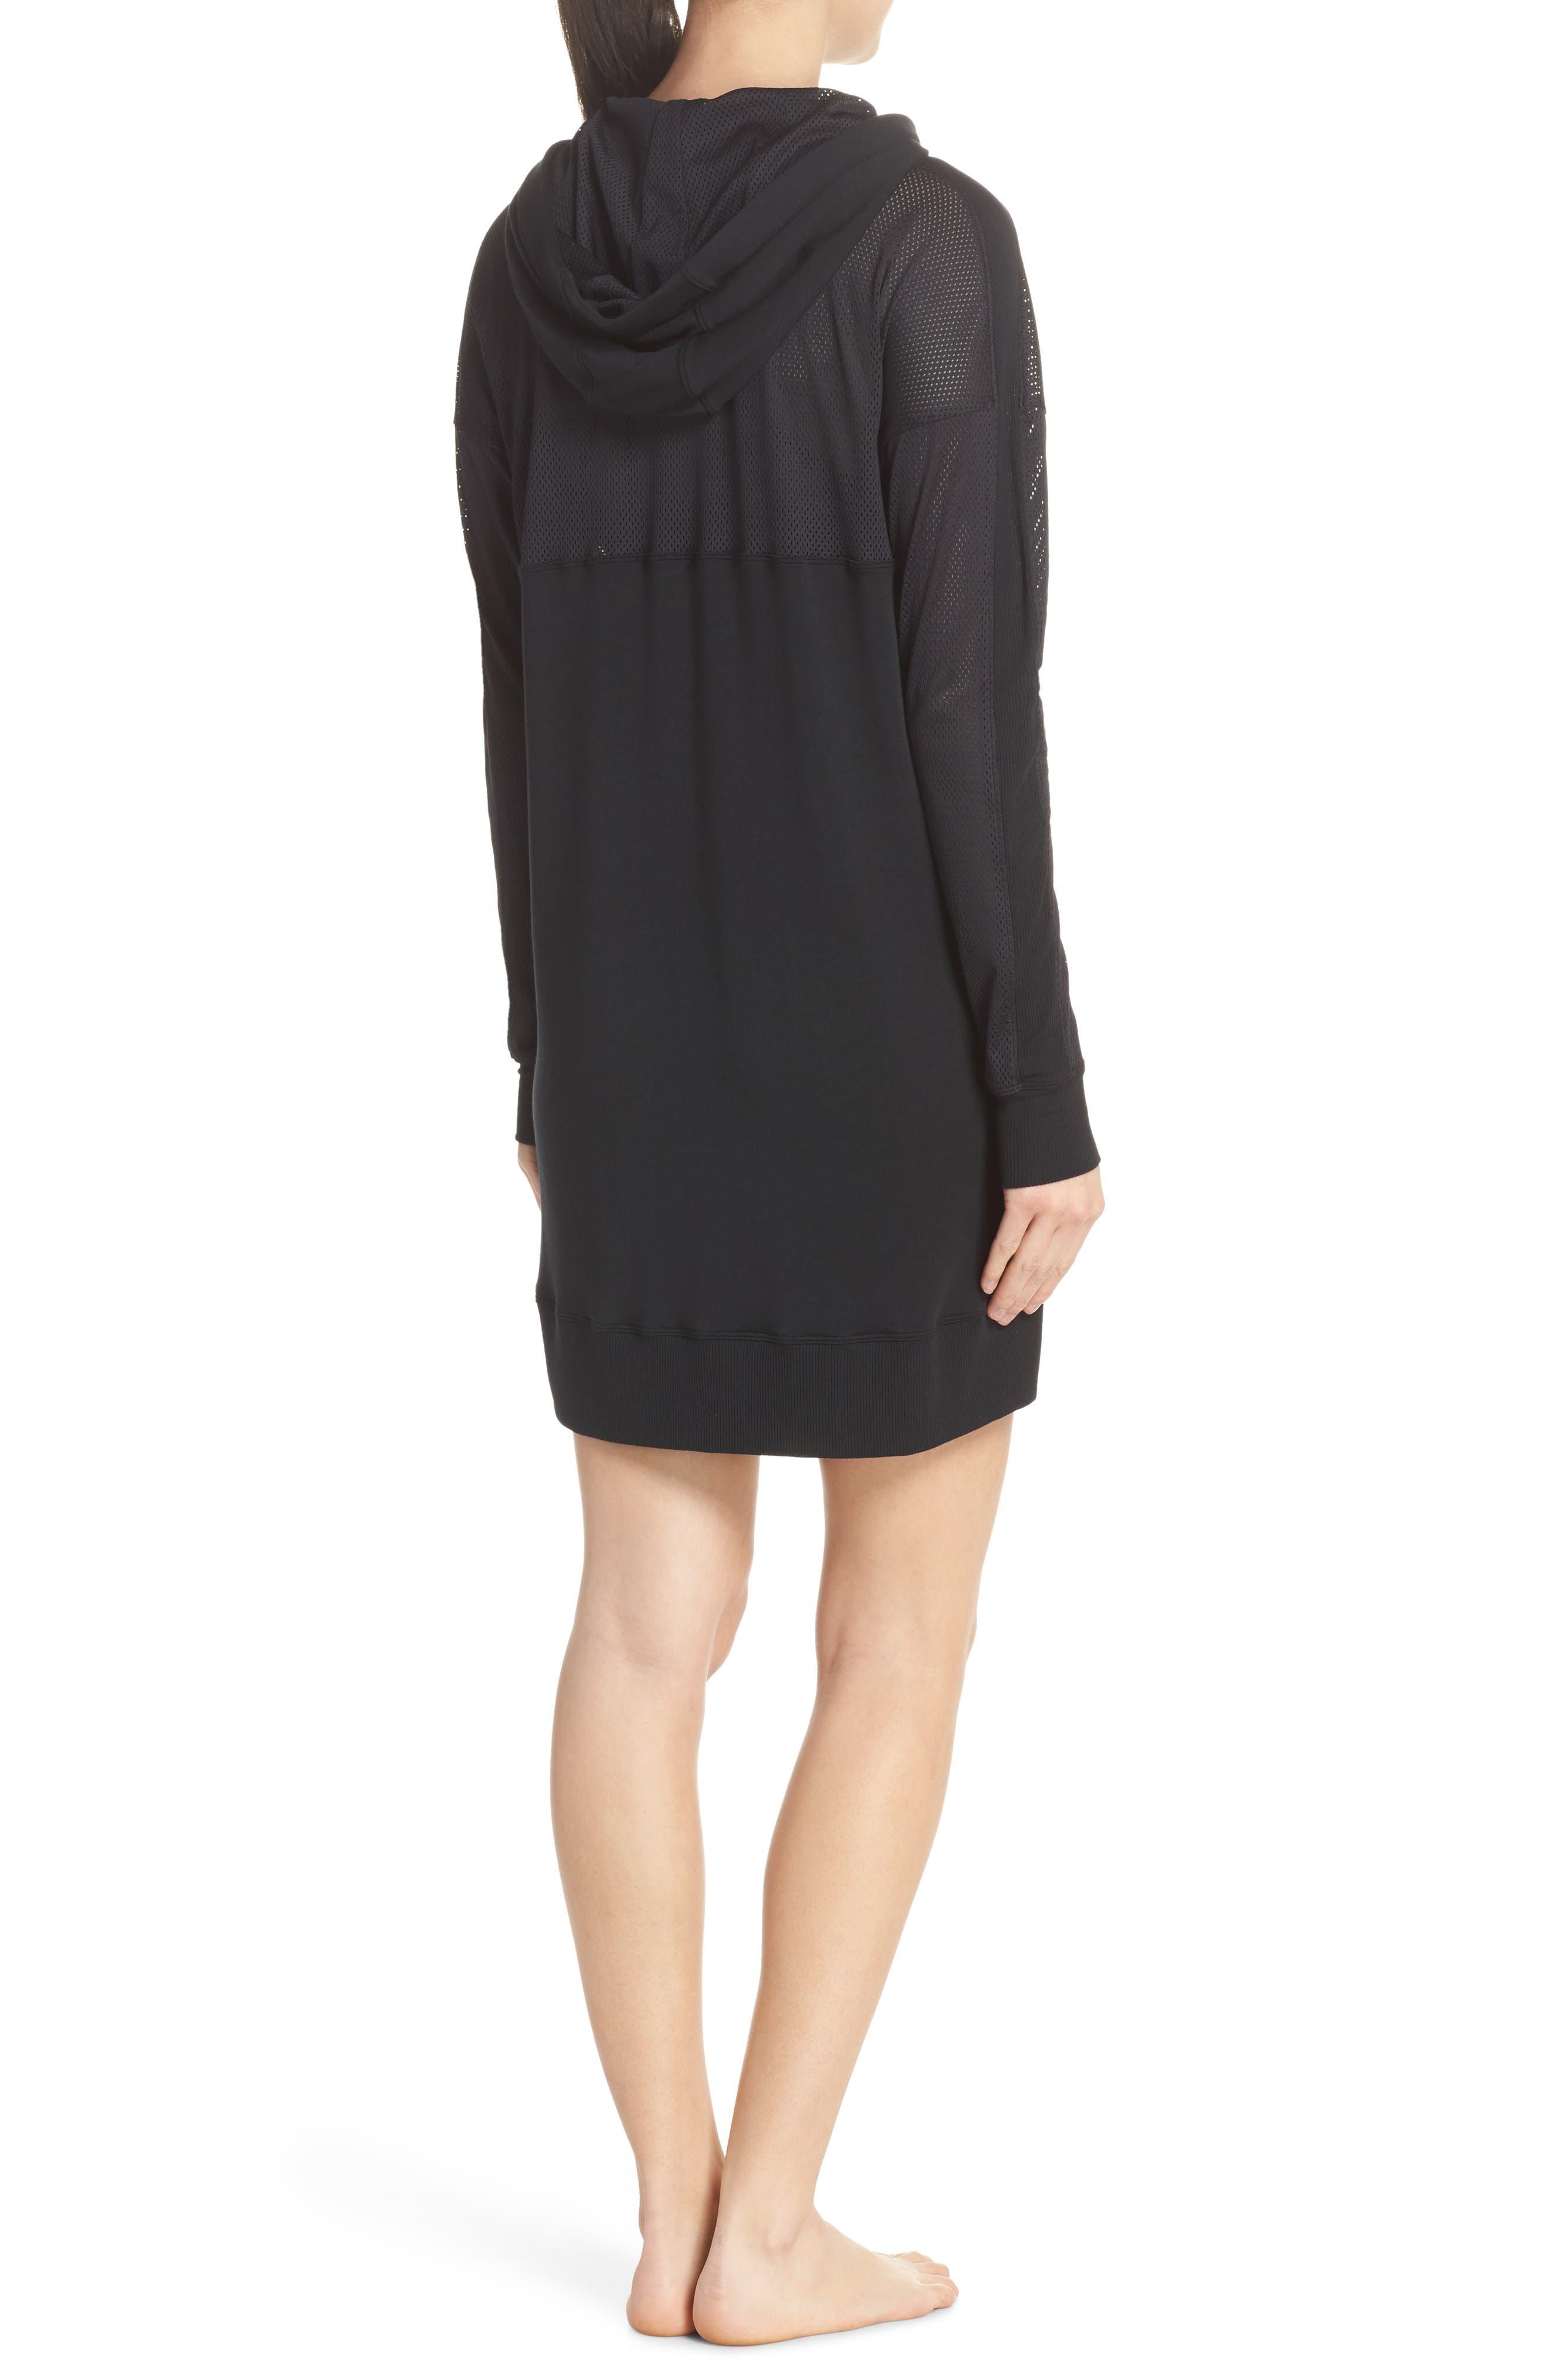 Range Dress,                             Alternate thumbnail 2, color,                             001